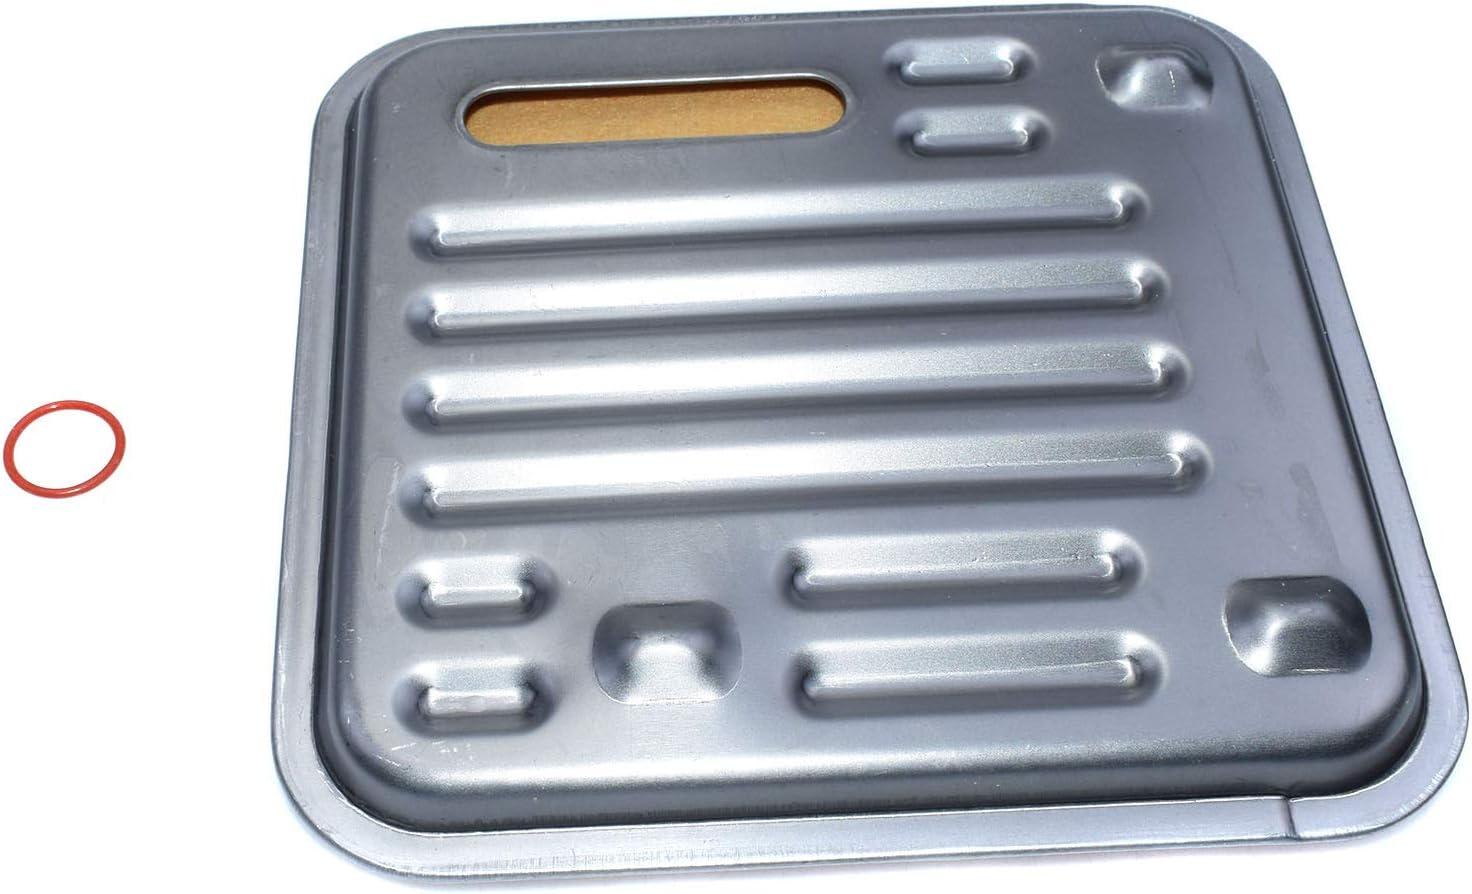 Transmission Filter Fit For Chrysler 41TES Super intense SALE OFFer A604 Dodge 40TE 41TE